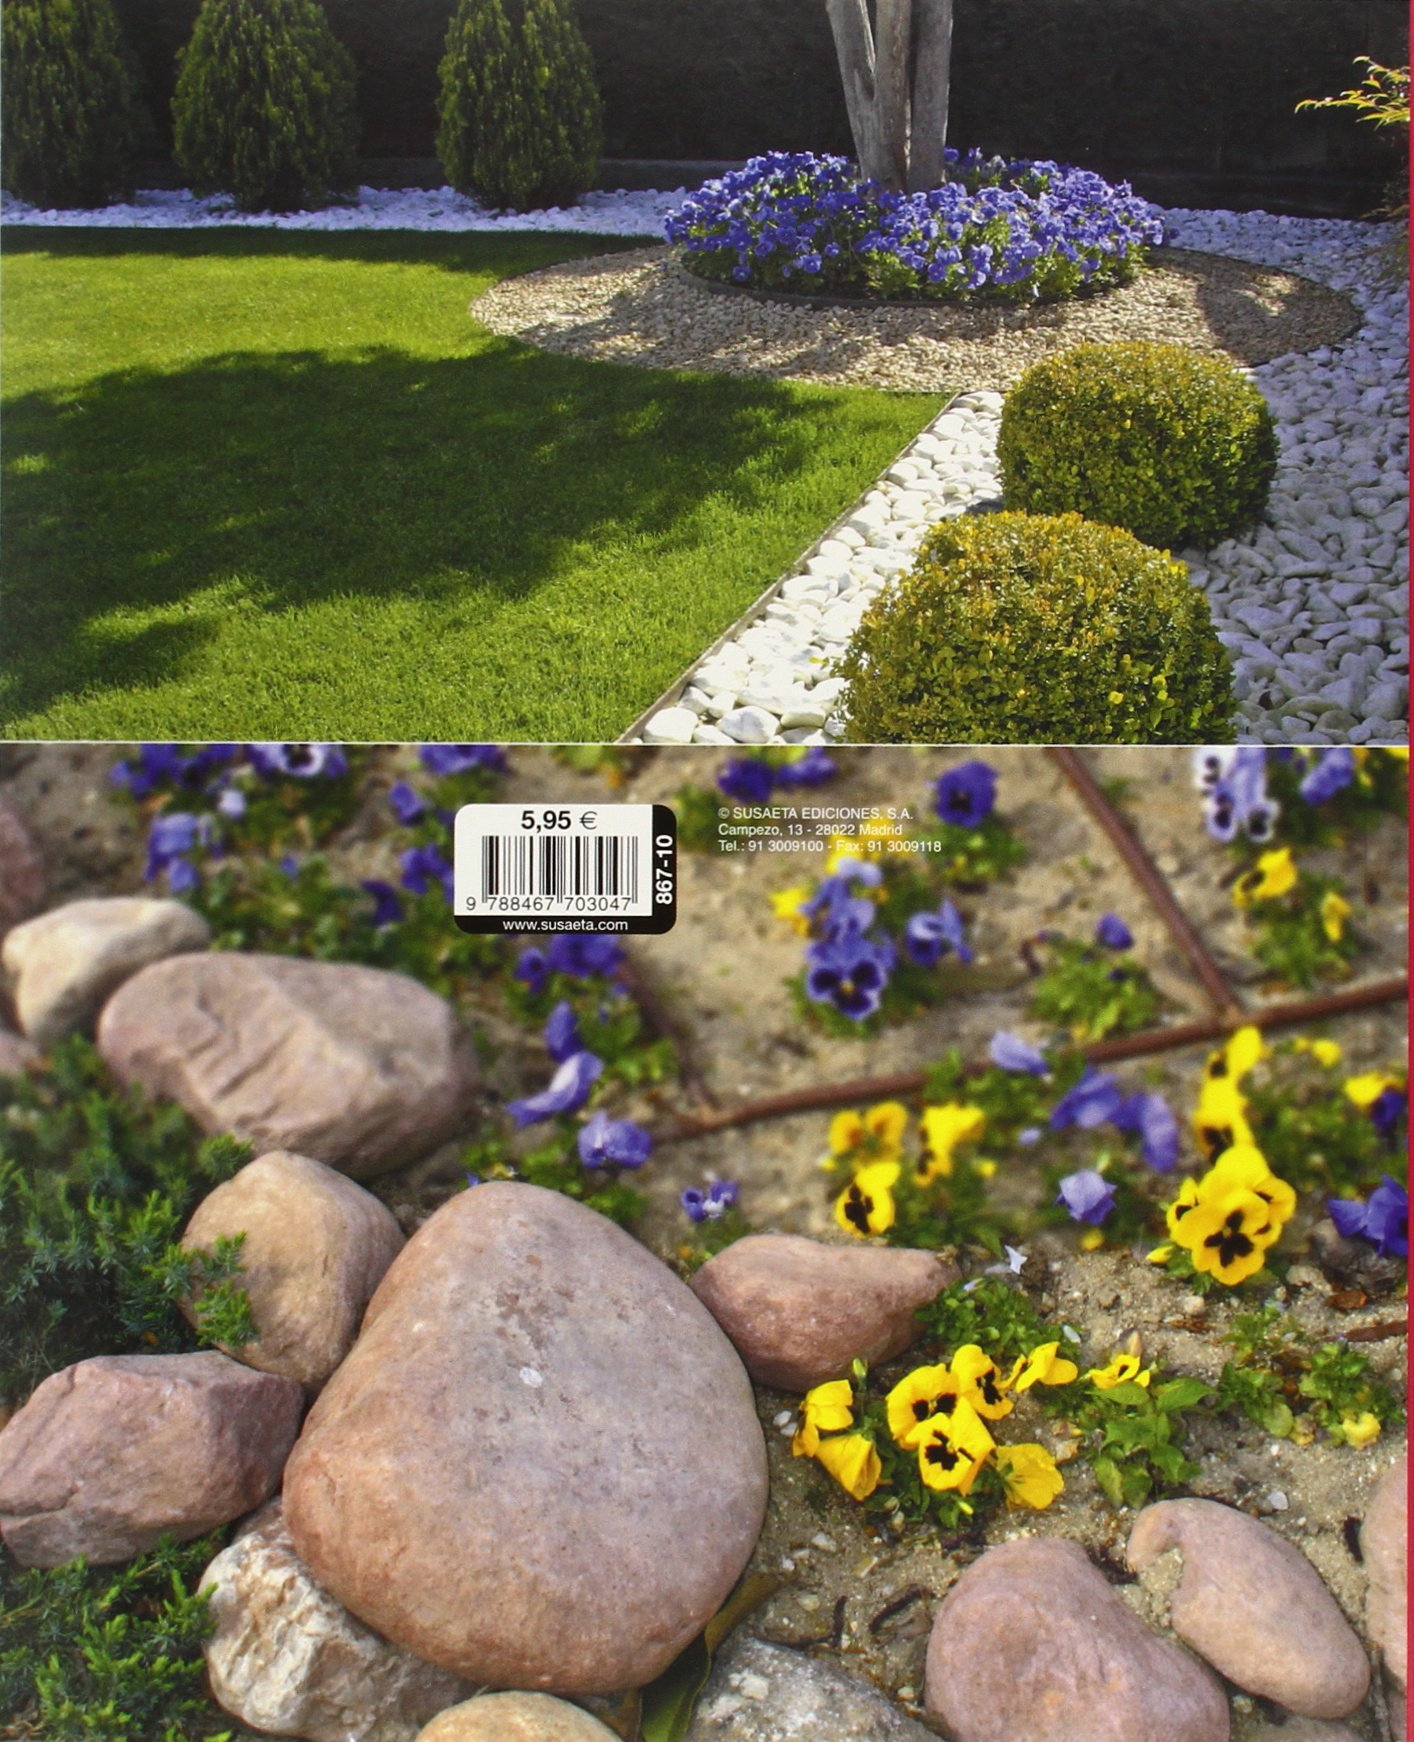 Jardineria sin agua: Xerojardineria (Plantas de Jardin) (Spanish Edition):  Inc. Susaeta Publishing: 9788467703047: Amazon.com: Books